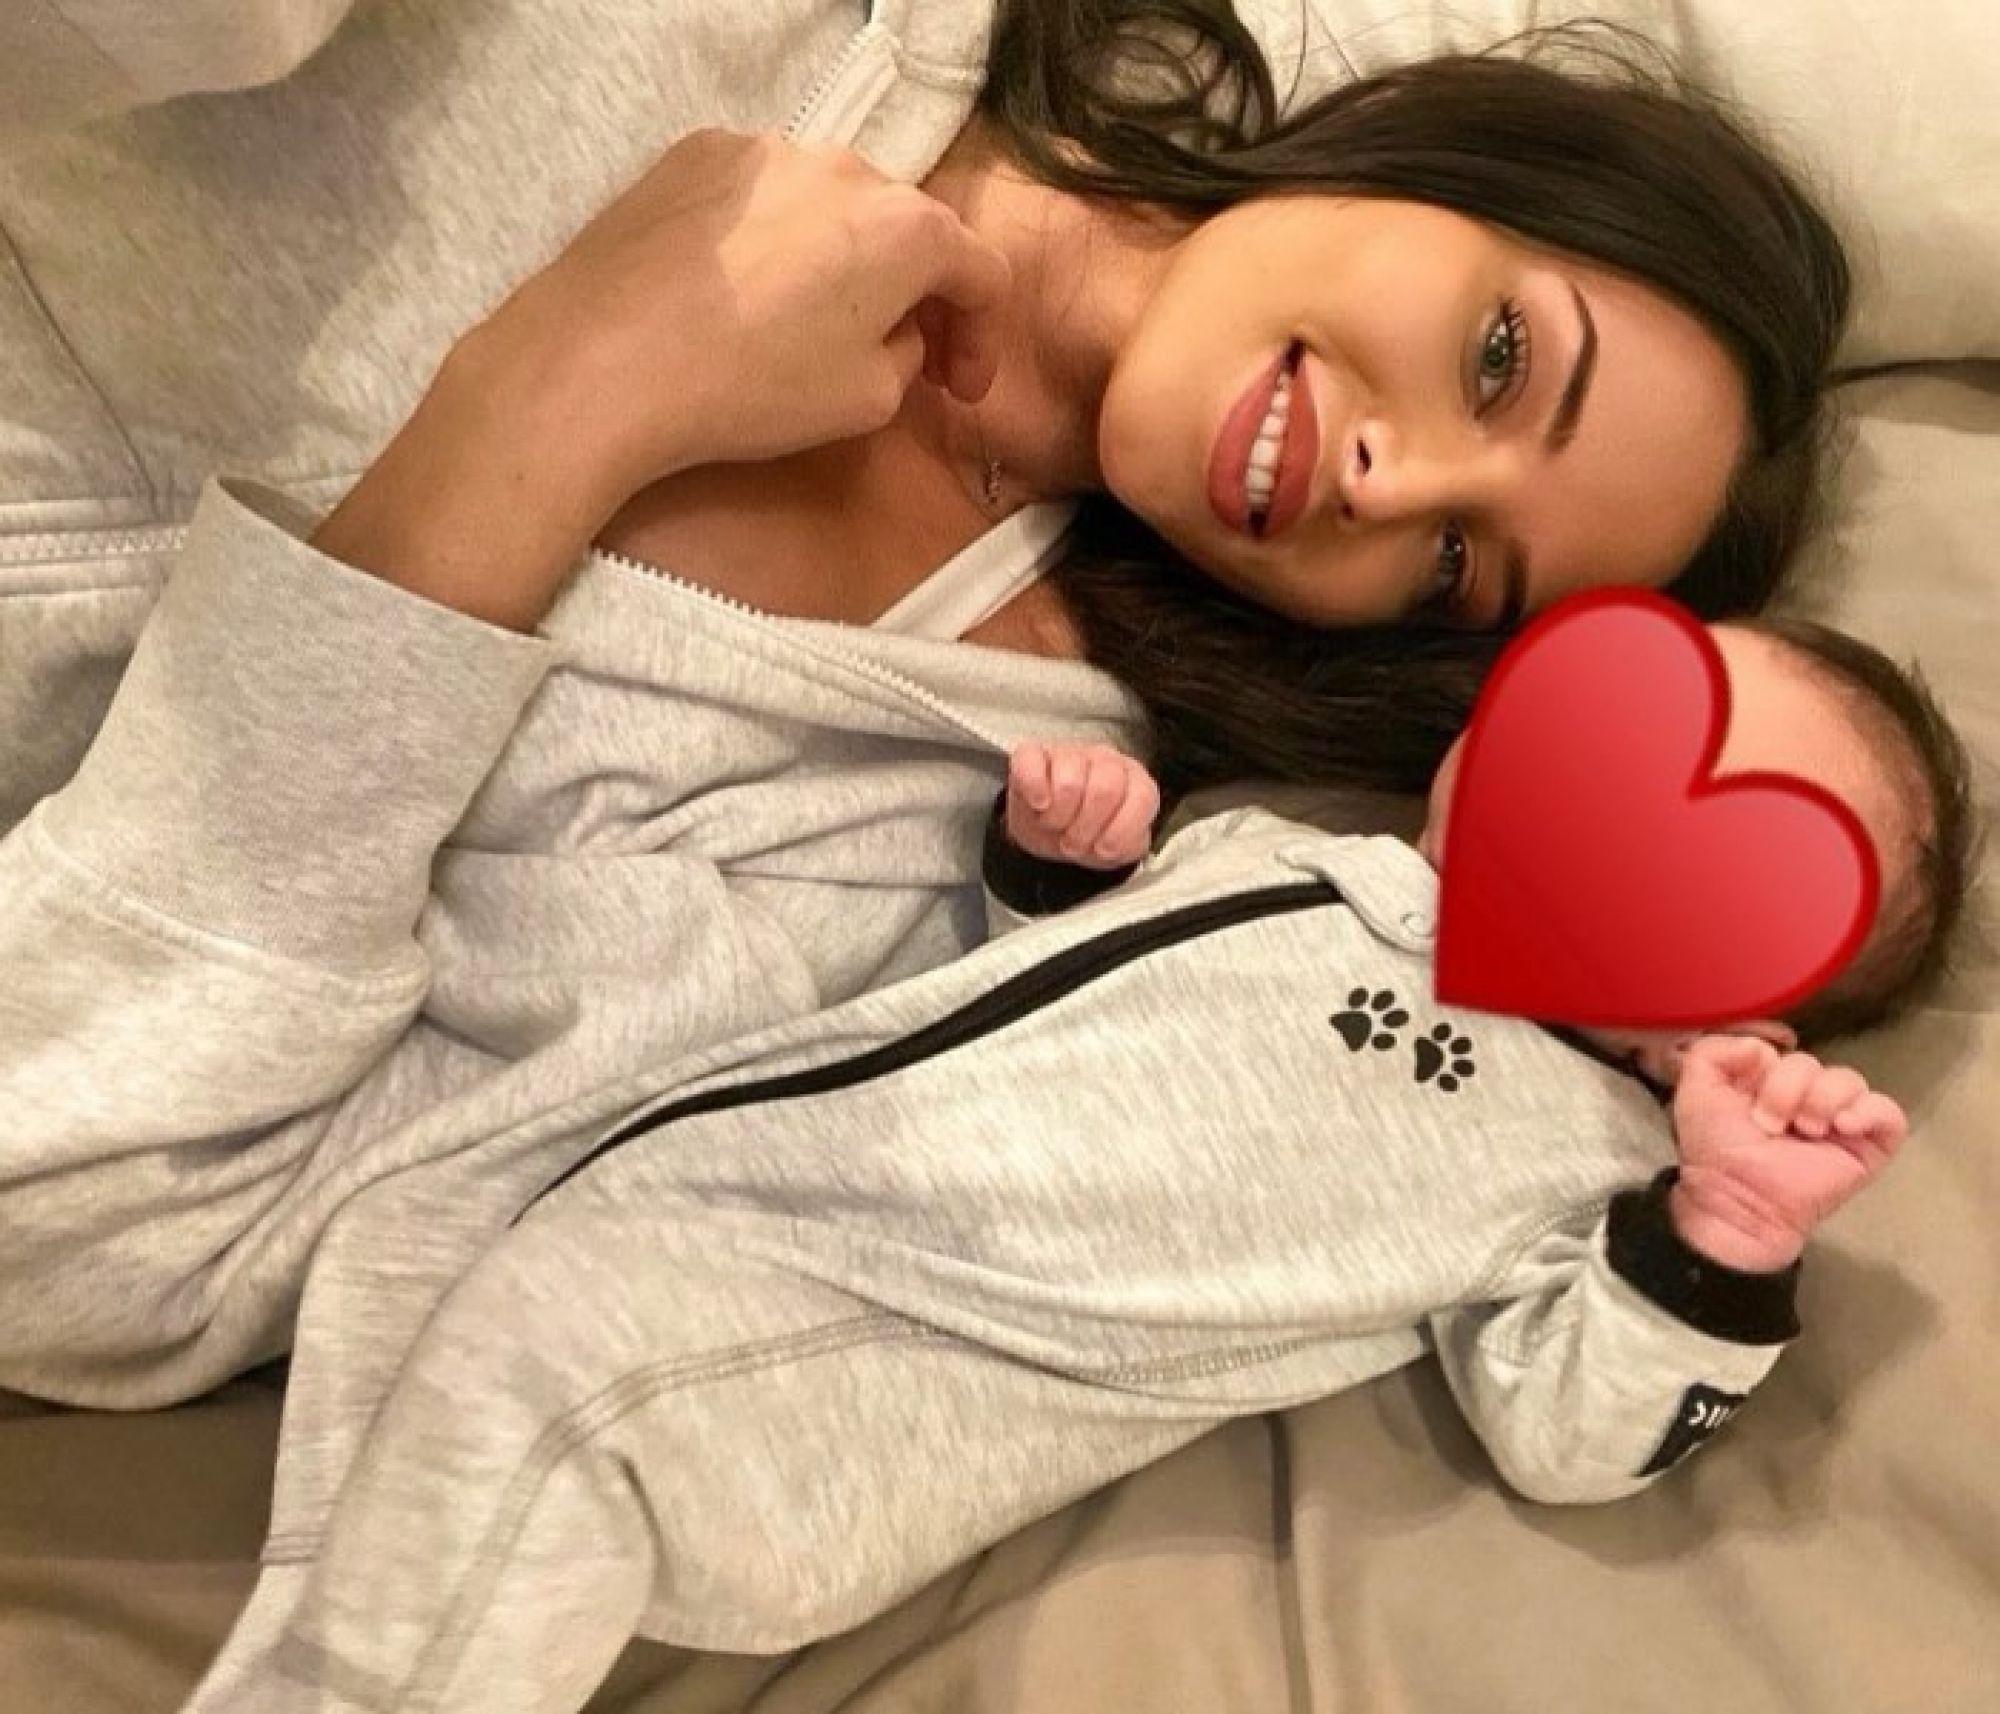 Анастасия Решетова случайно показала лицо сына на совместном фото с Тимати